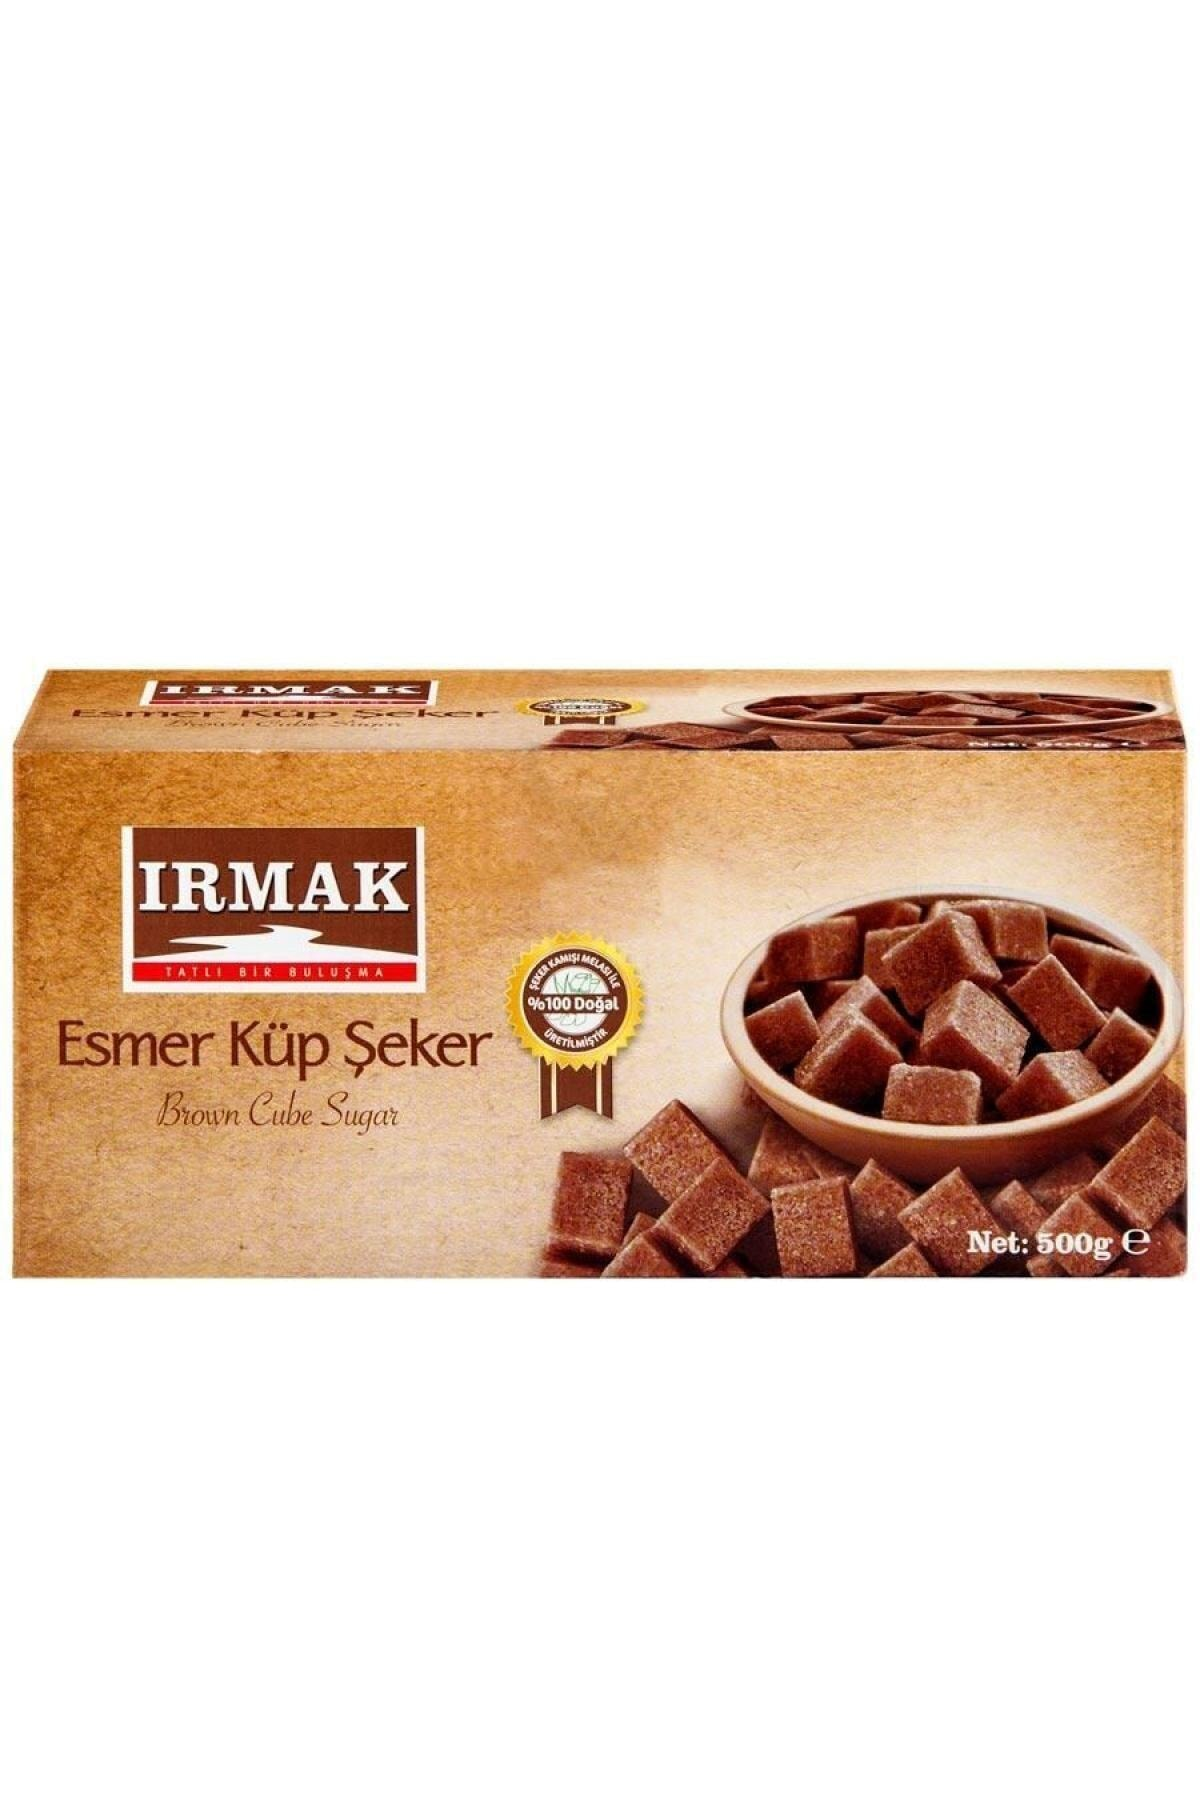 Irmak Esmer Küp Şeker 500 gr 2